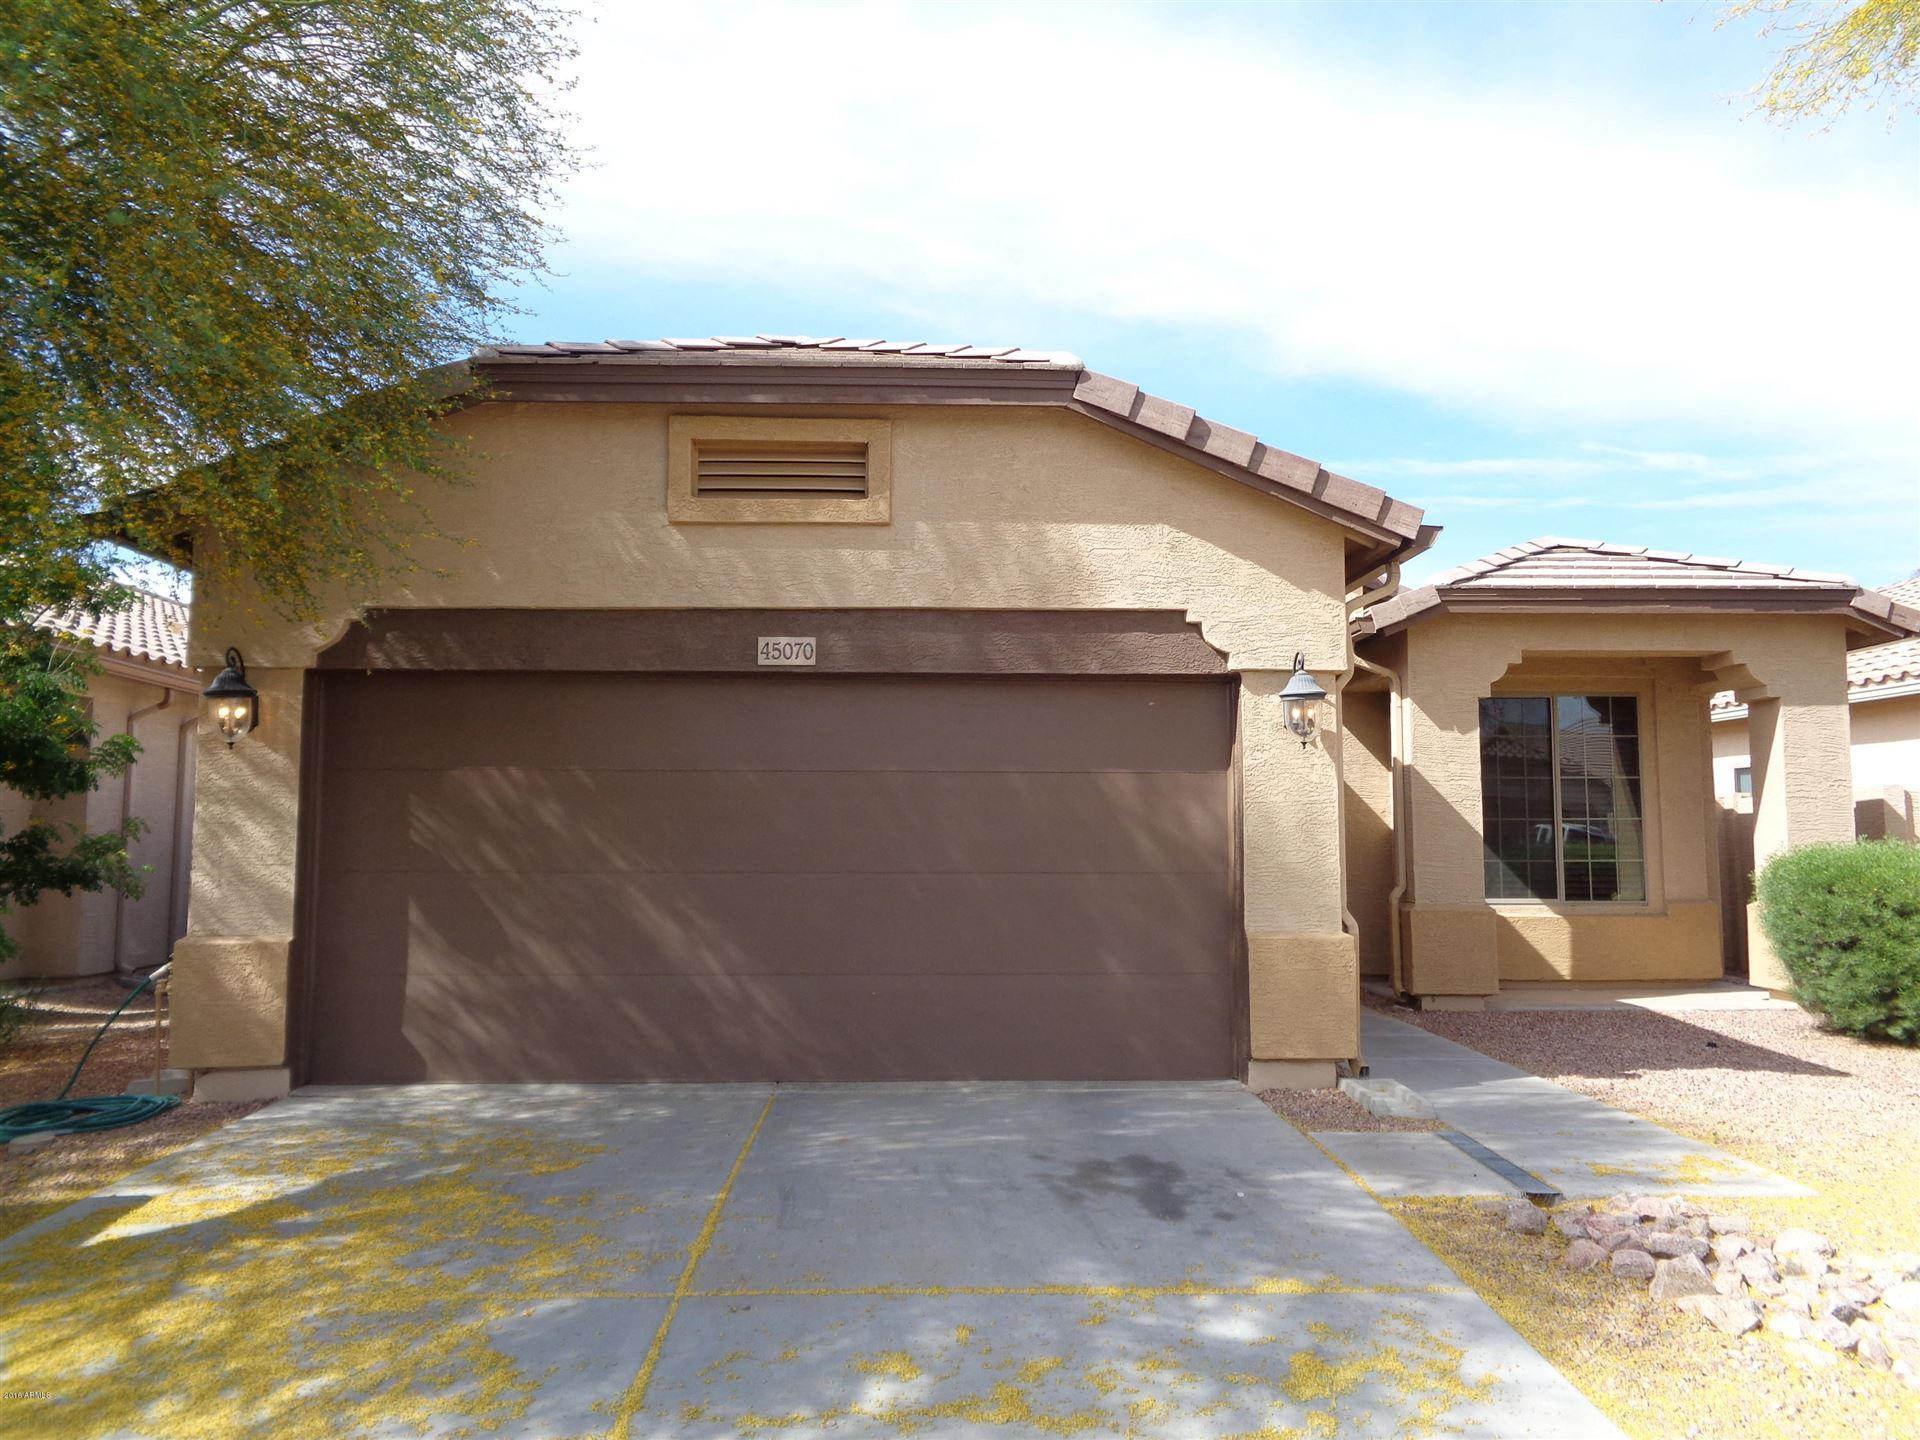 Photo for 45070 W MESCAL Street, Maricopa, AZ 85139 (MLS # 6245926)